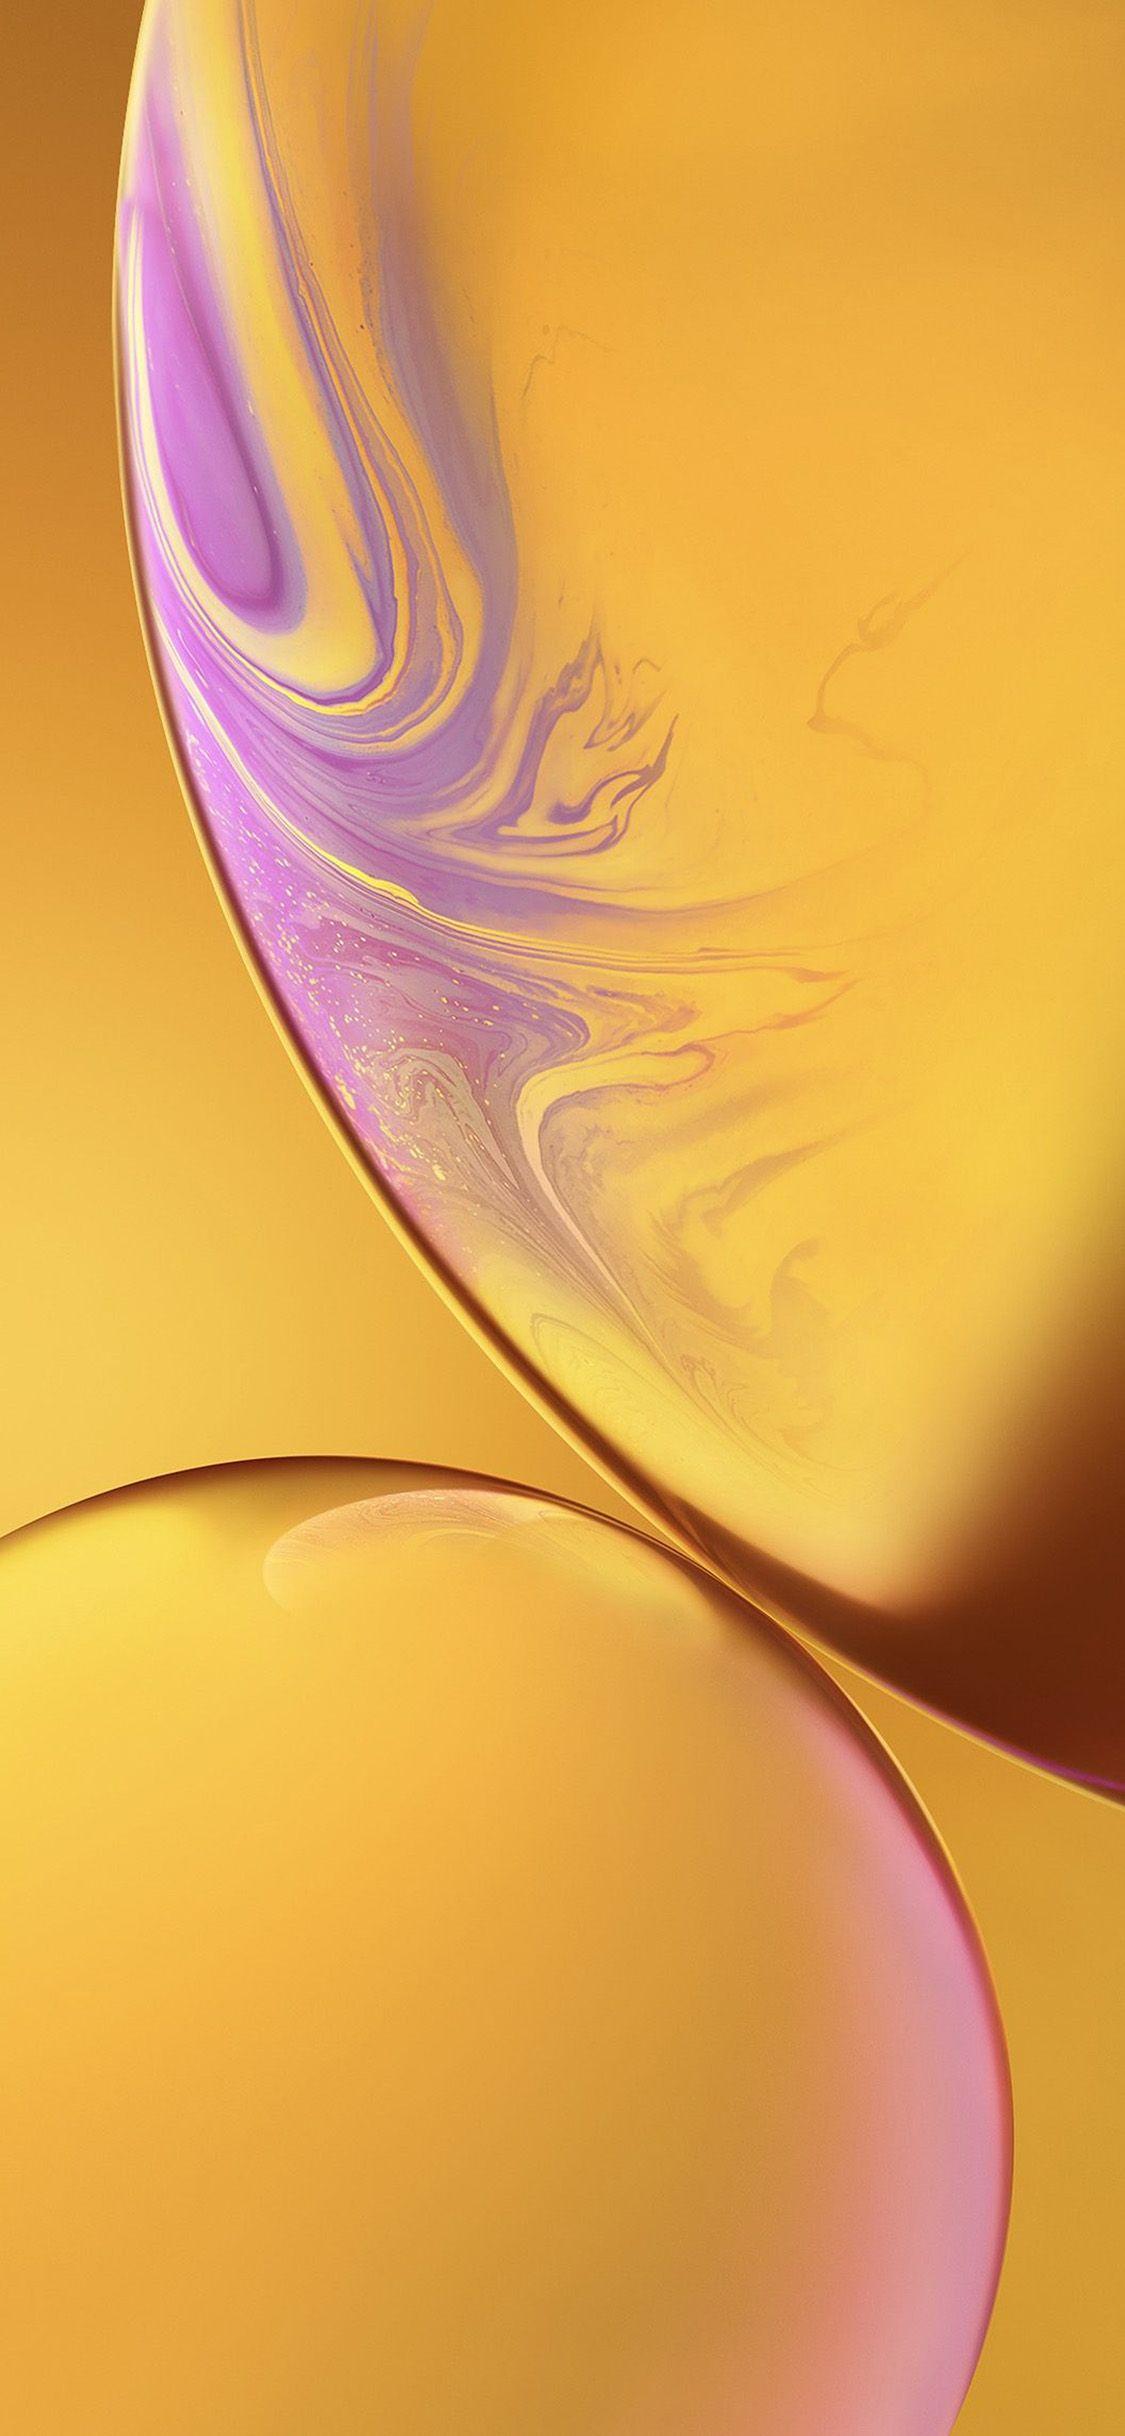 Bg35 Iphone Xs Max Apple Official Art Yellow Bubble Via Http Iphonexpapers Com Iphone Wallpaper Yellow Apple Logo Wallpaper Iphone Abstract Iphone Wallpaper